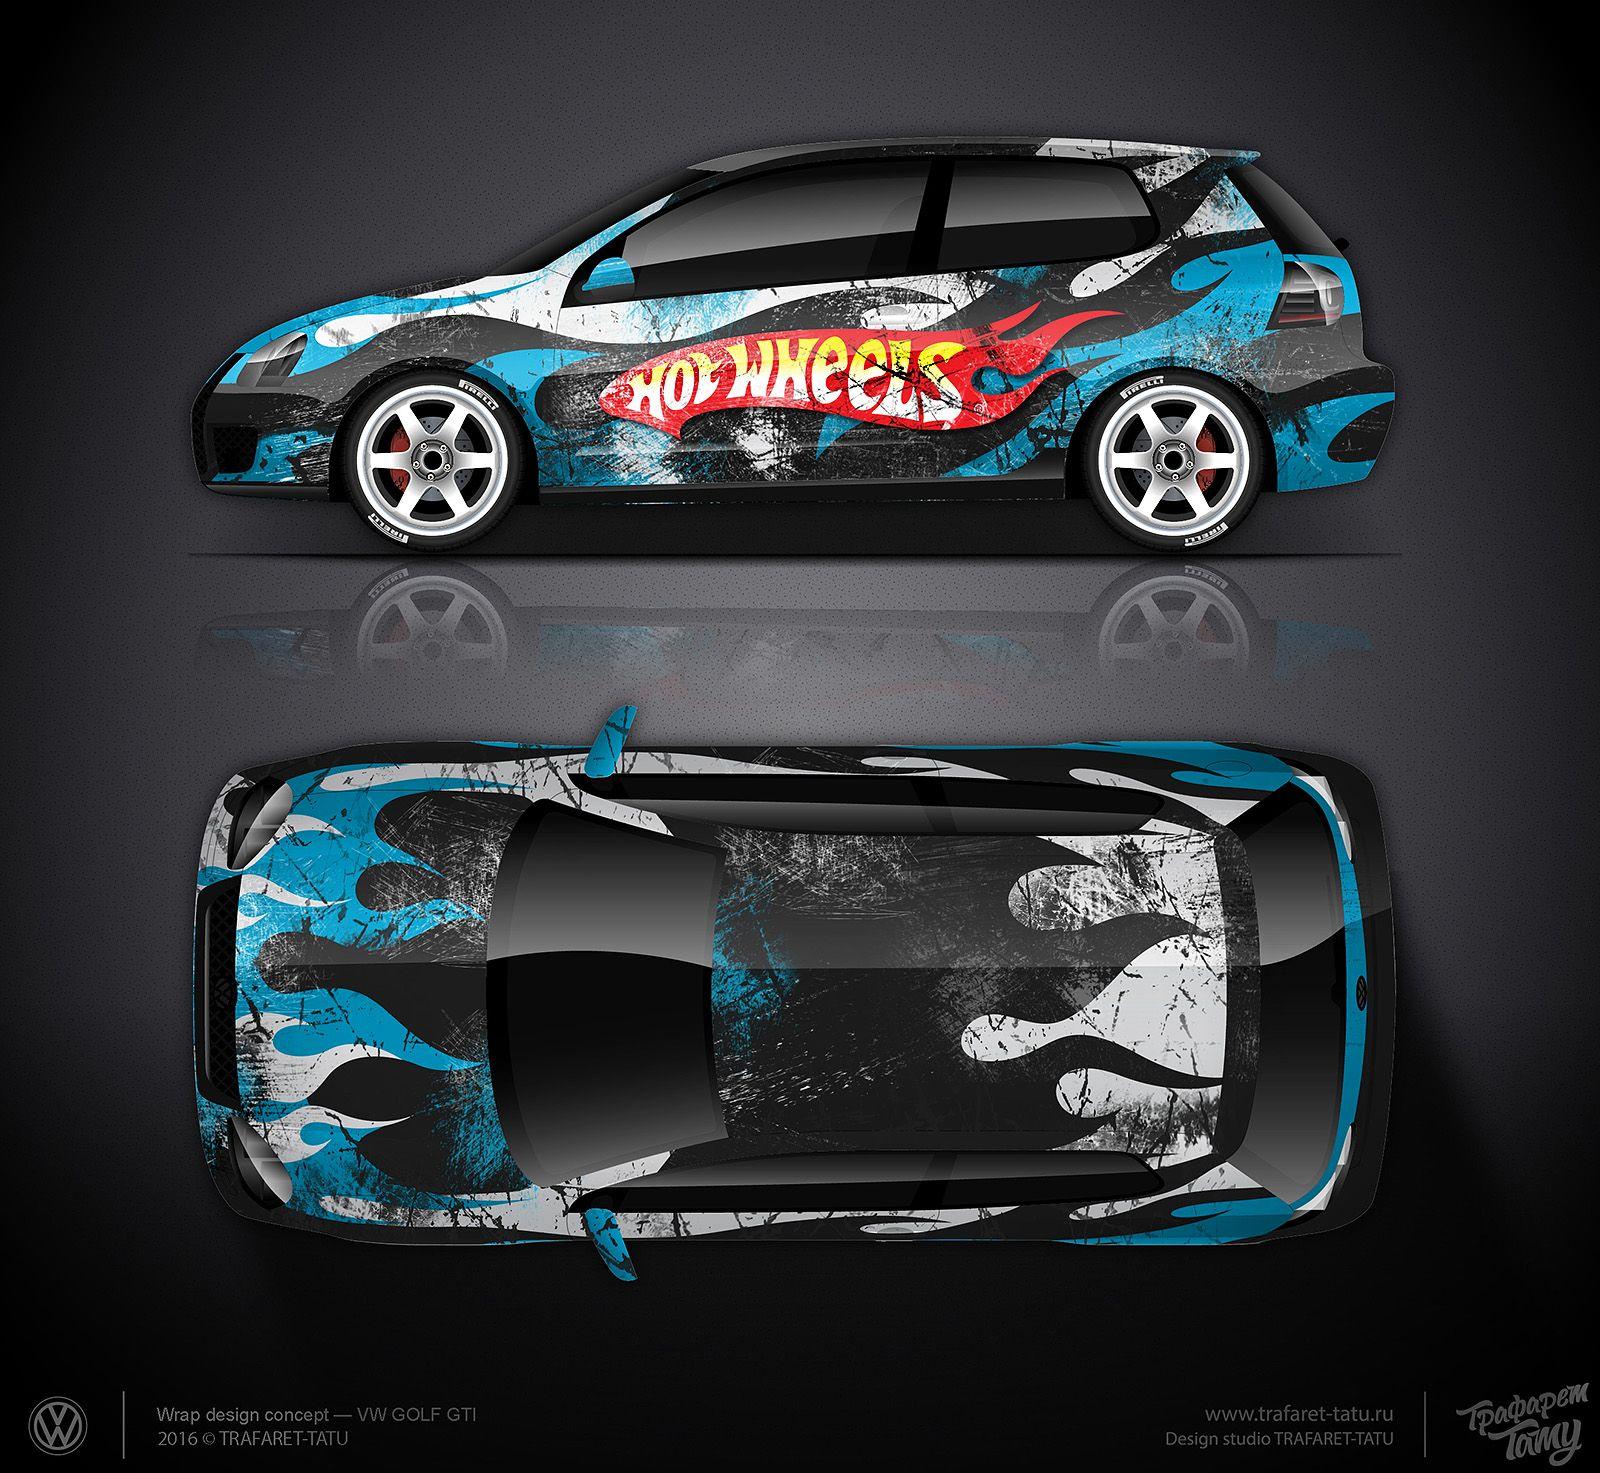 Design car wrap - Design Concept 2 Vw Golf Gti Hot Wheels Vehicle Wrapsdesign